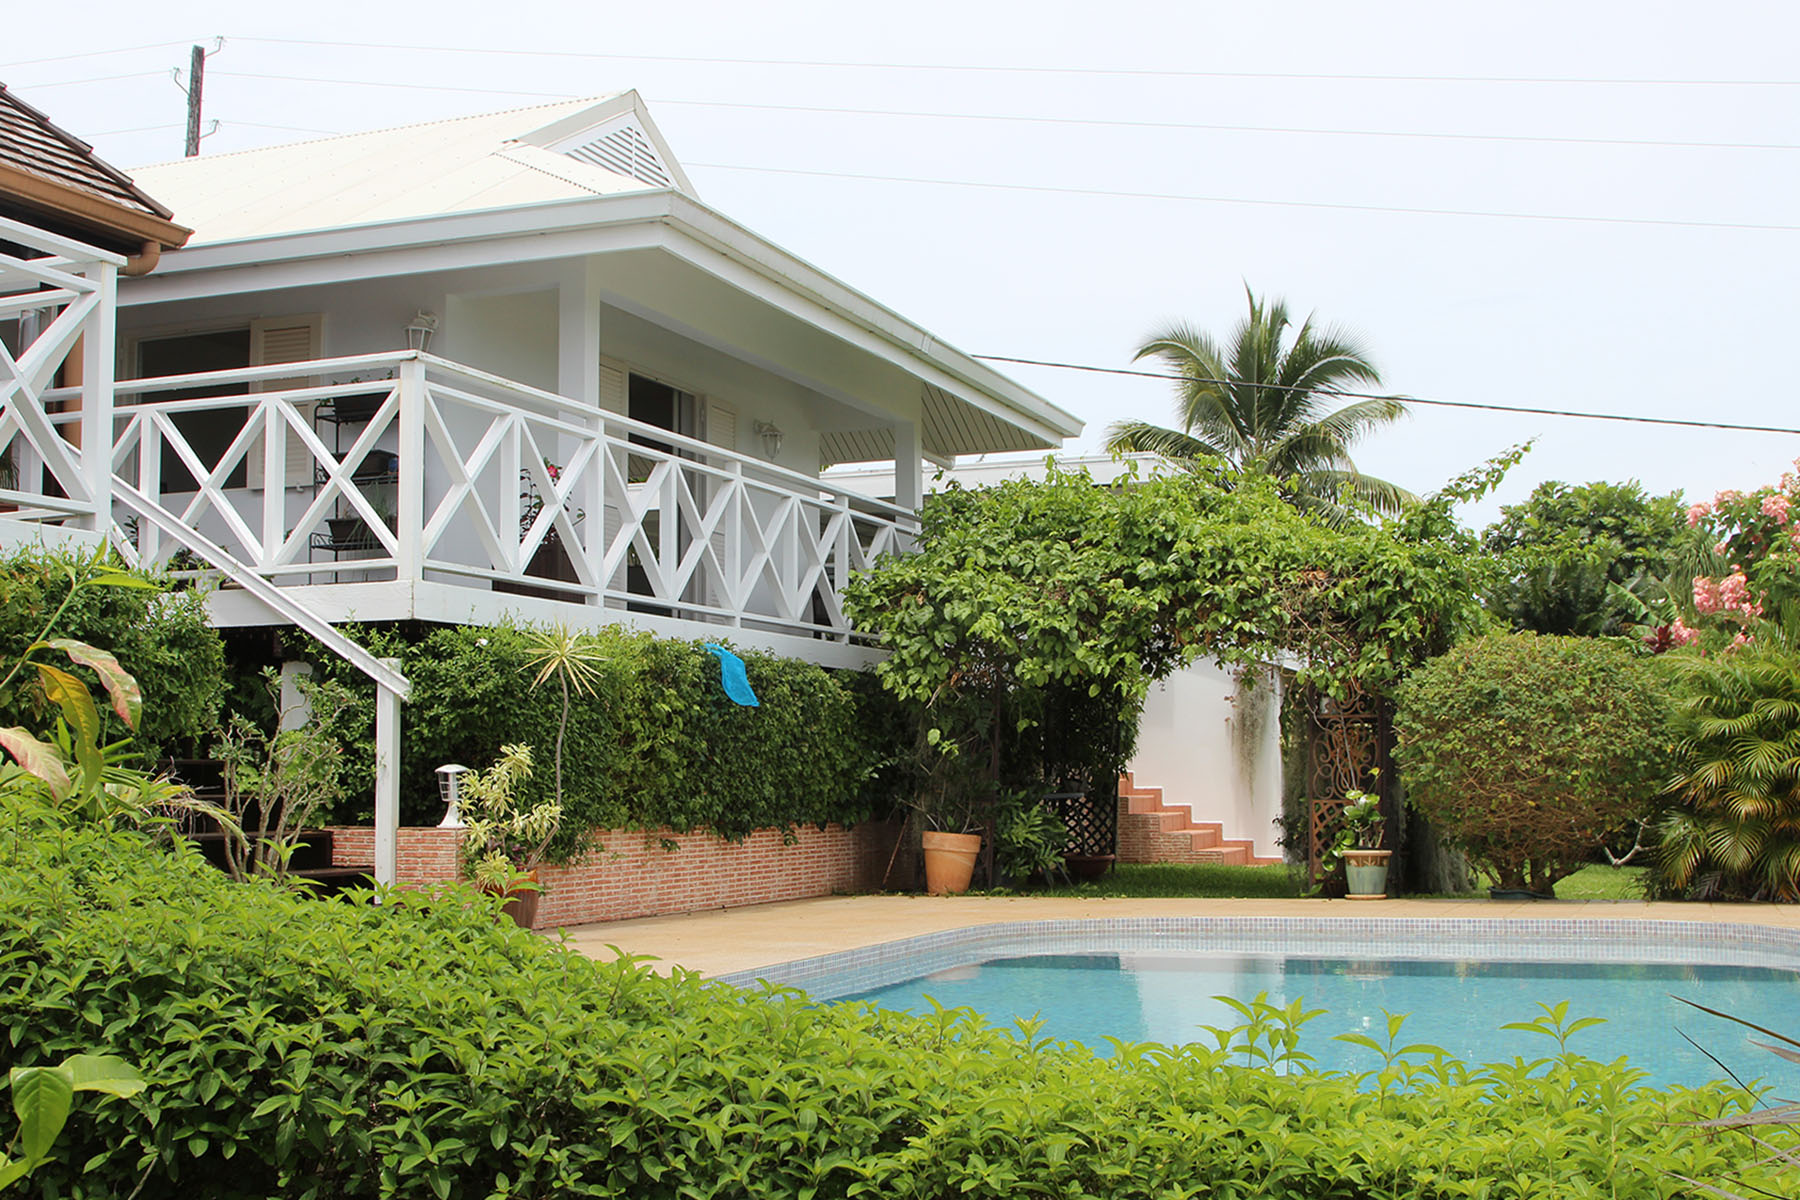 Casa Unifamiliar por un Venta en Tahiti East coast elegant house Tahiti, French Polynesia